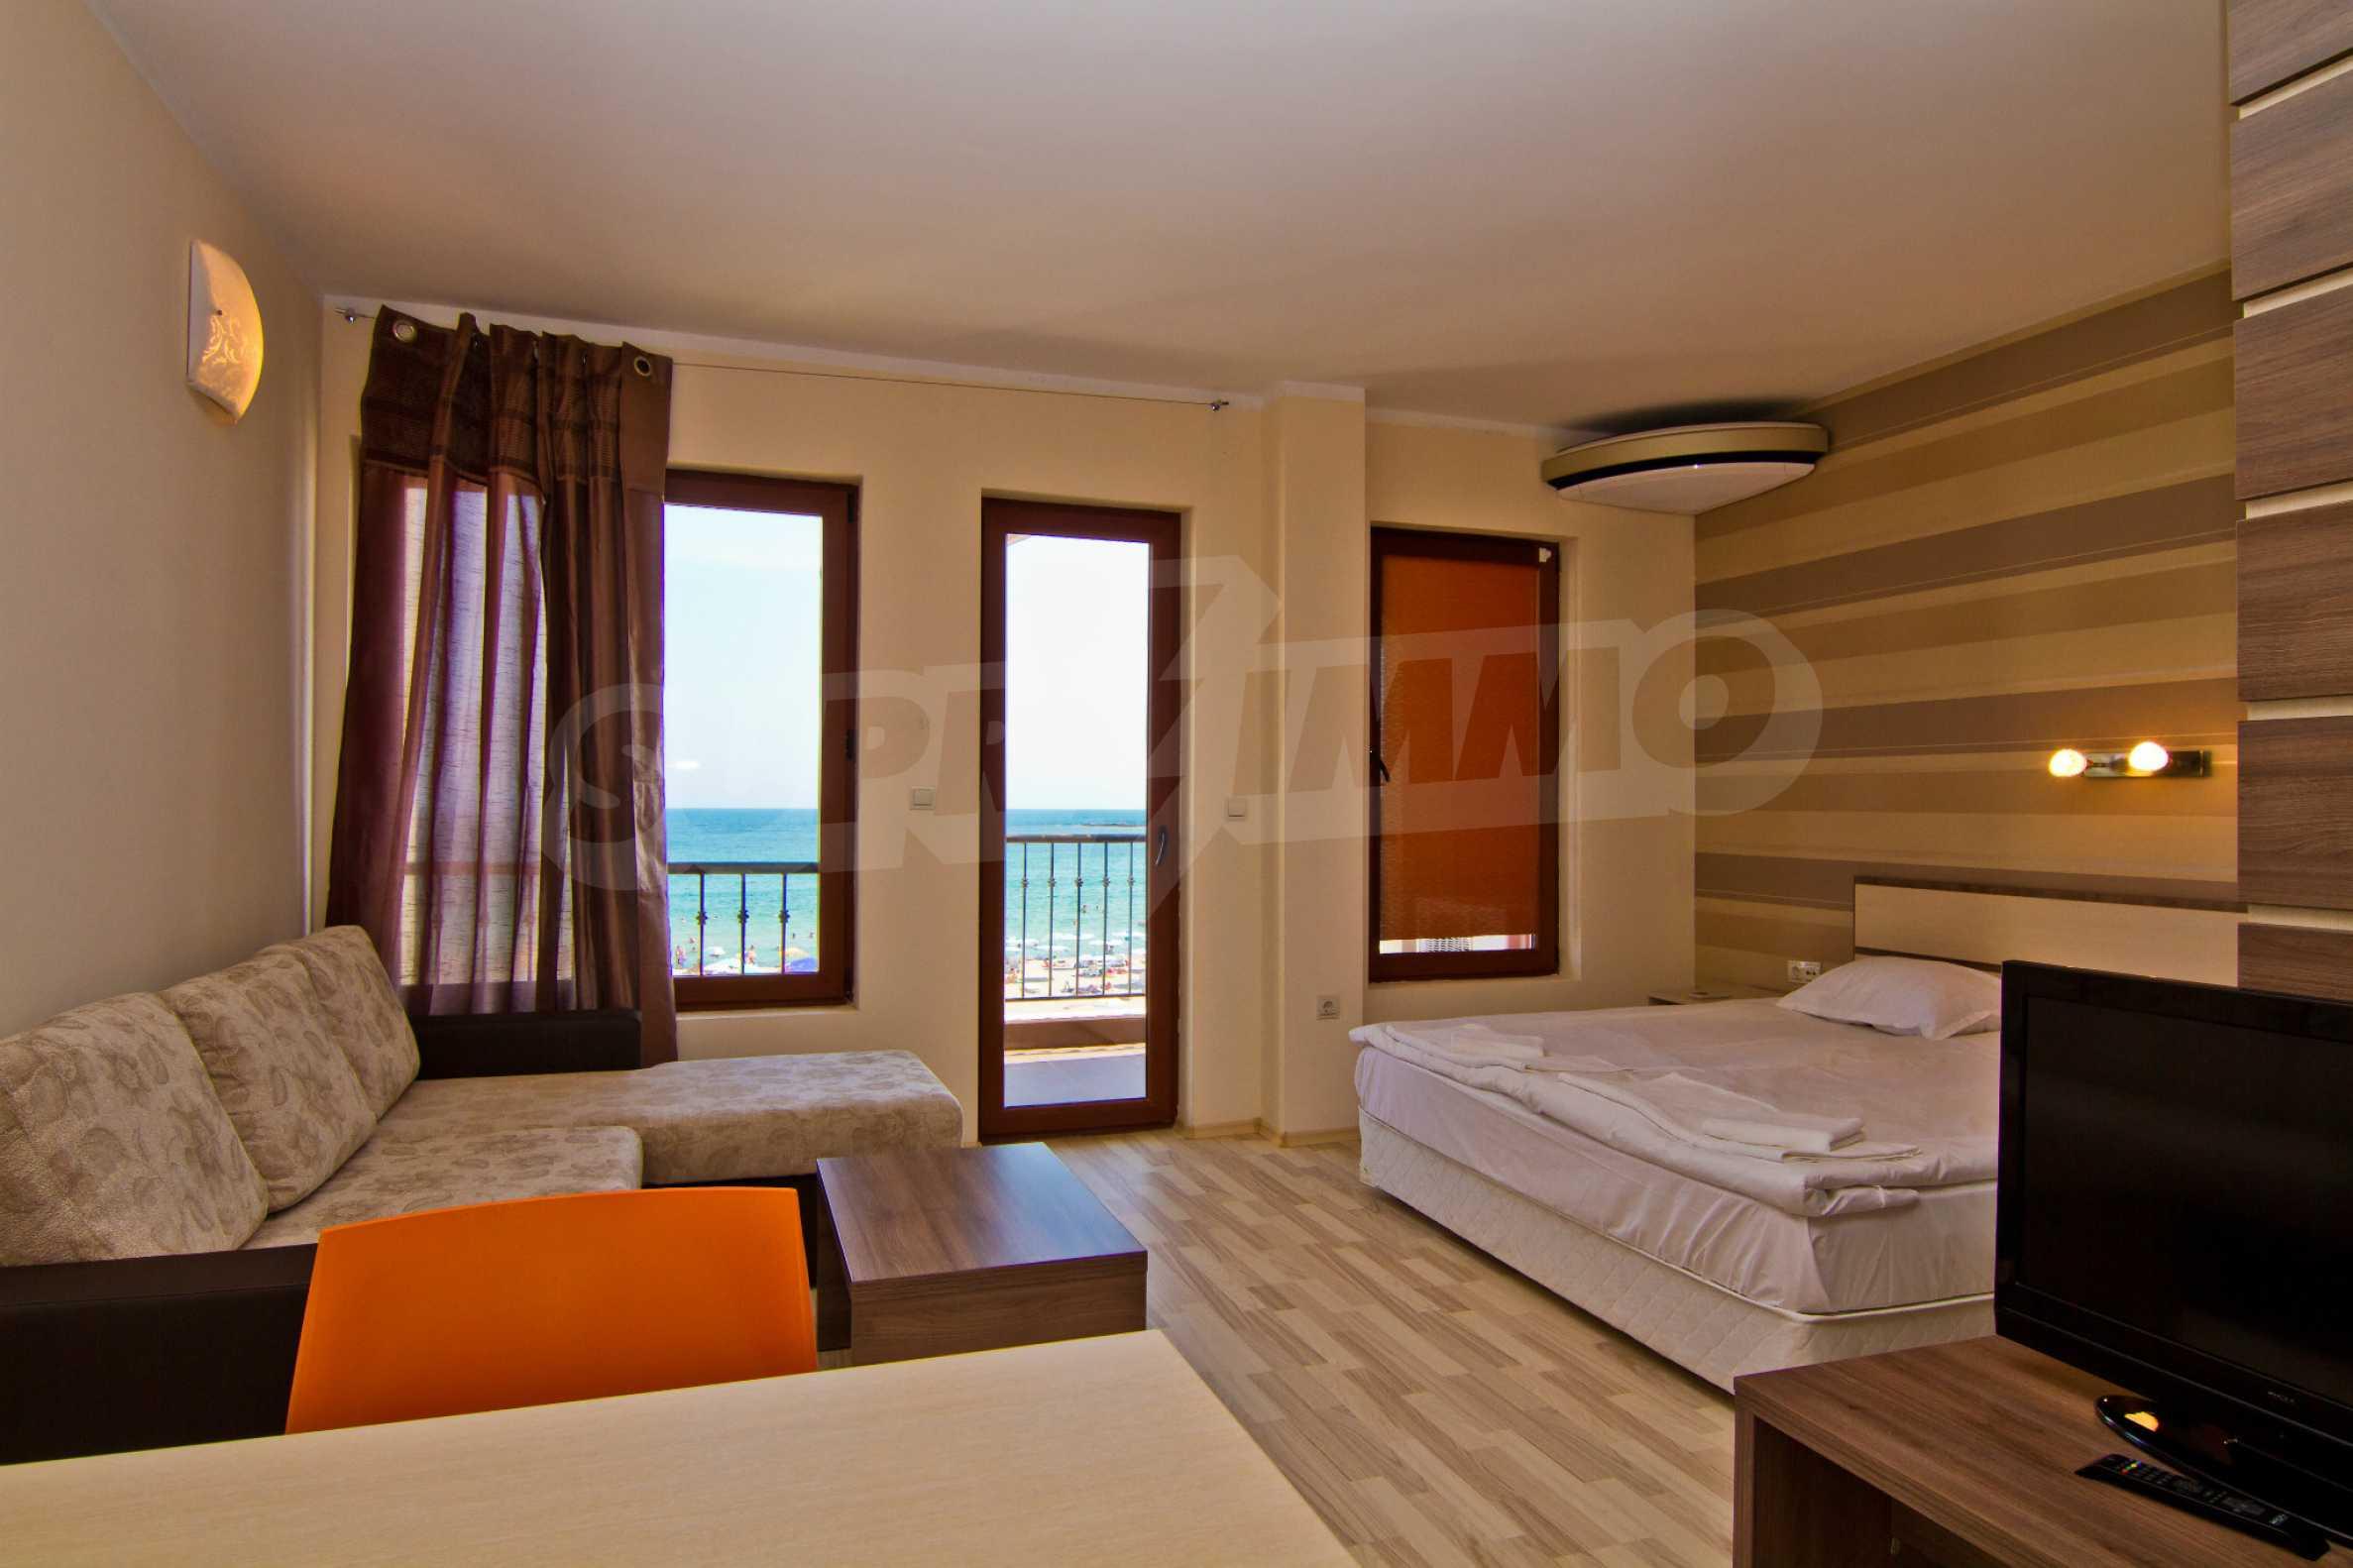 Примеа Бийч Резиденс / Primea Beach Residence 48